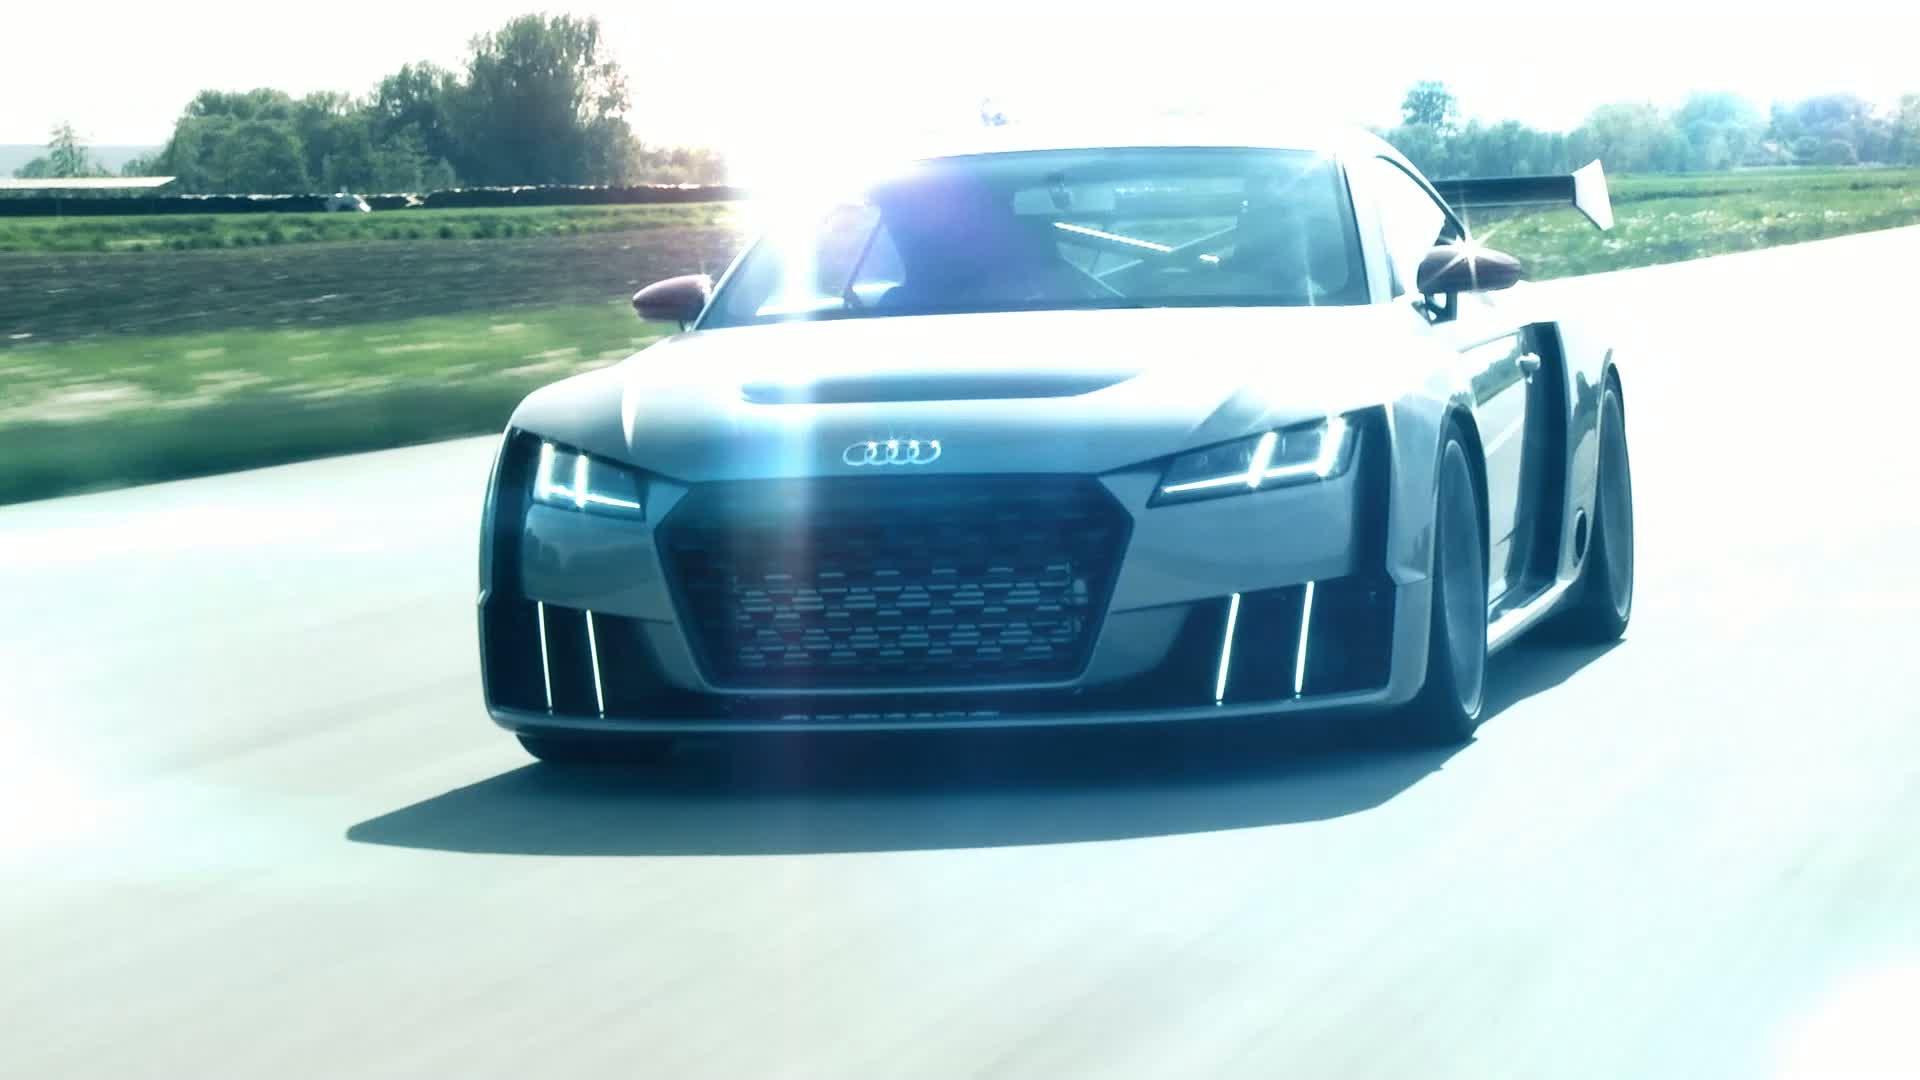 The Audi TT clubsport turbo technology concept car